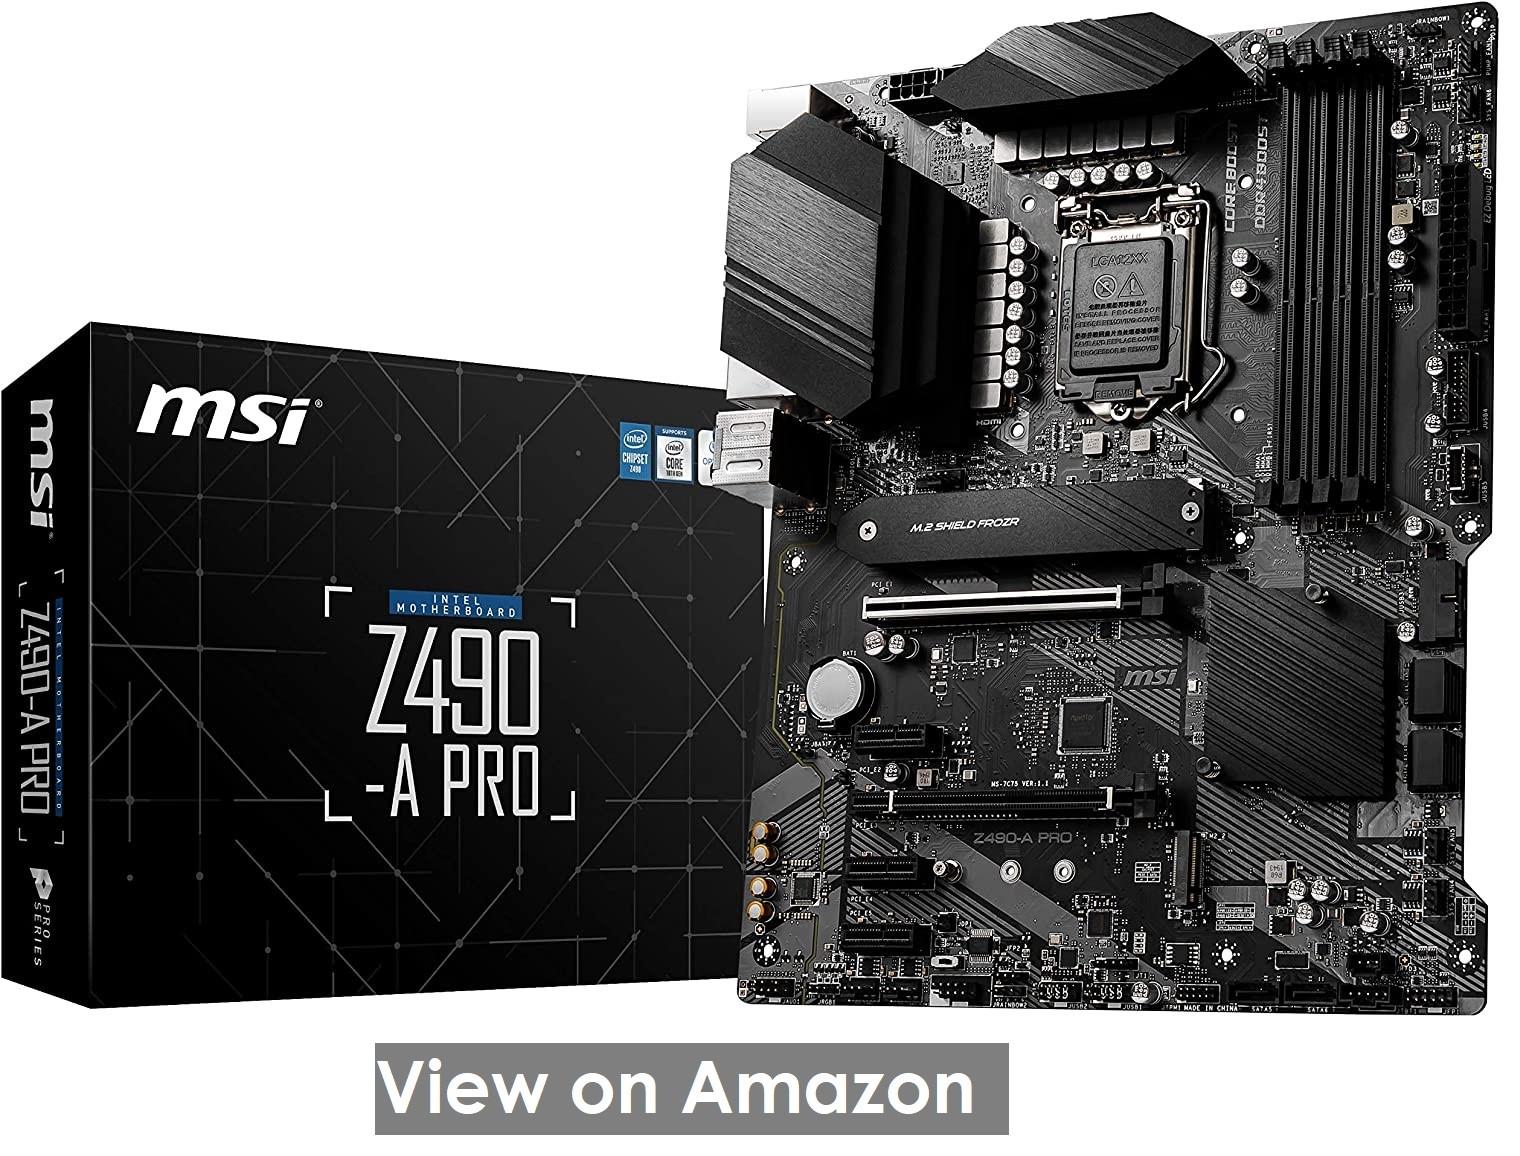 MSI Z490-A PRO ProSeries